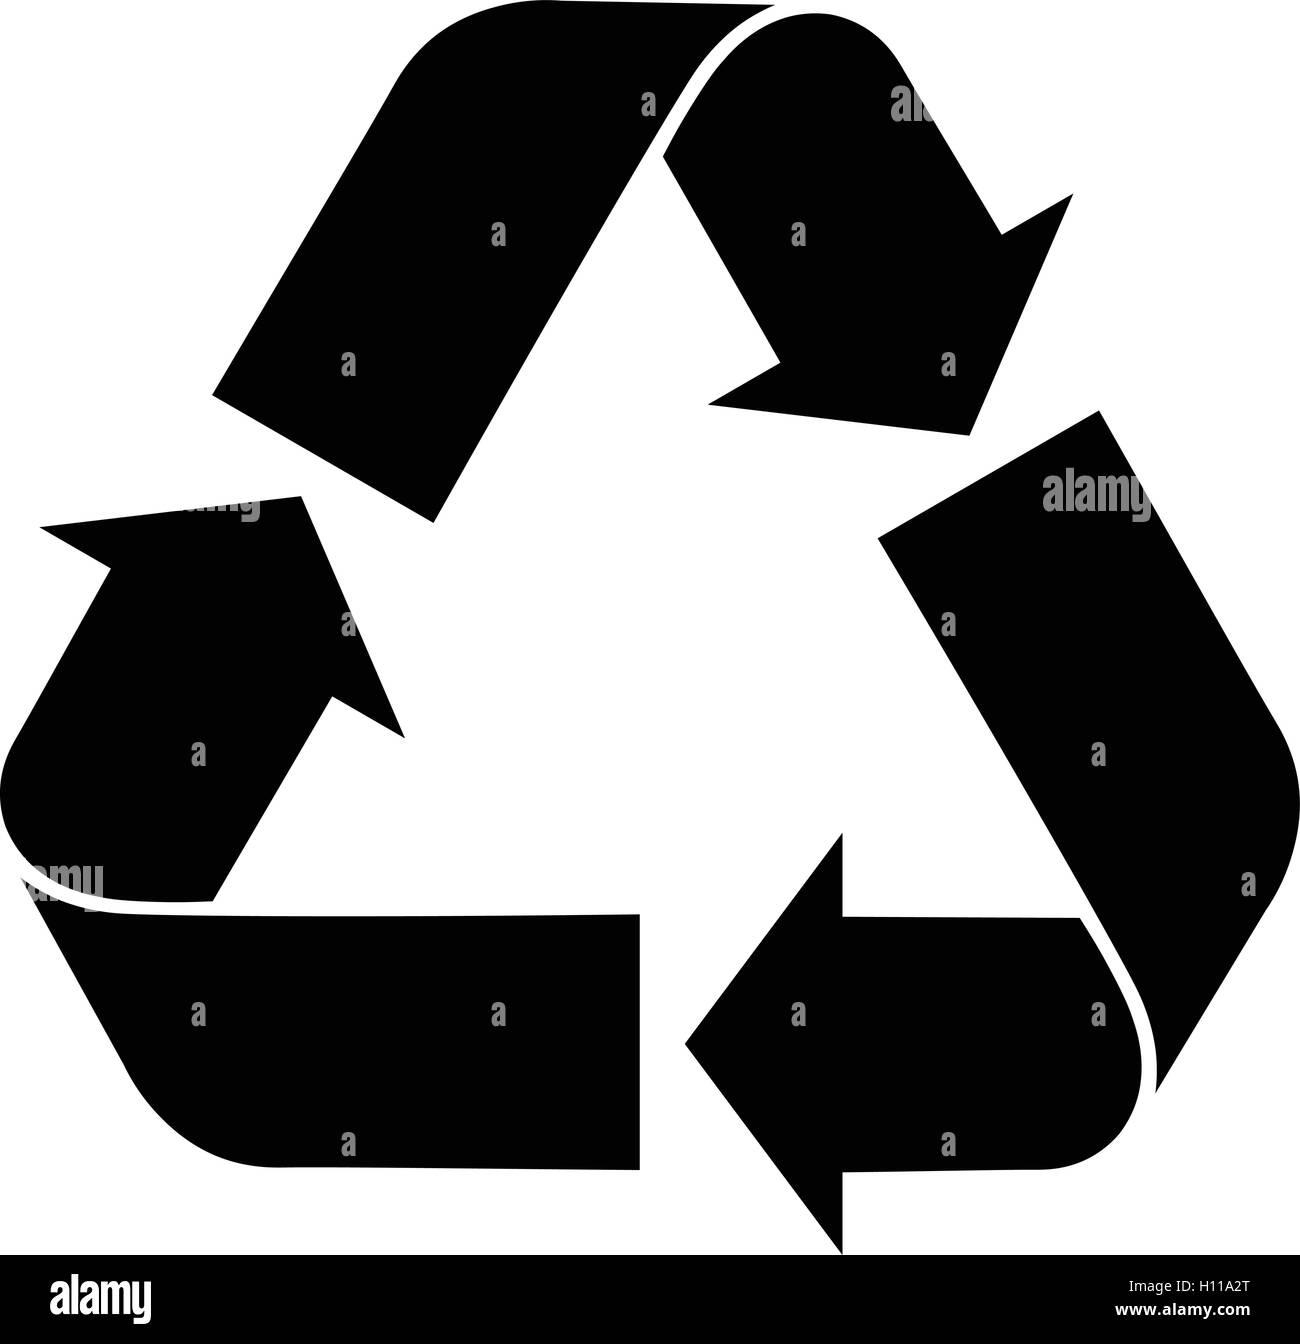 Universal recycling symbol recycle isolated black sign accurate universal recycling symbol recycle isolated black sign accurate vector illustration buycottarizona Choice Image